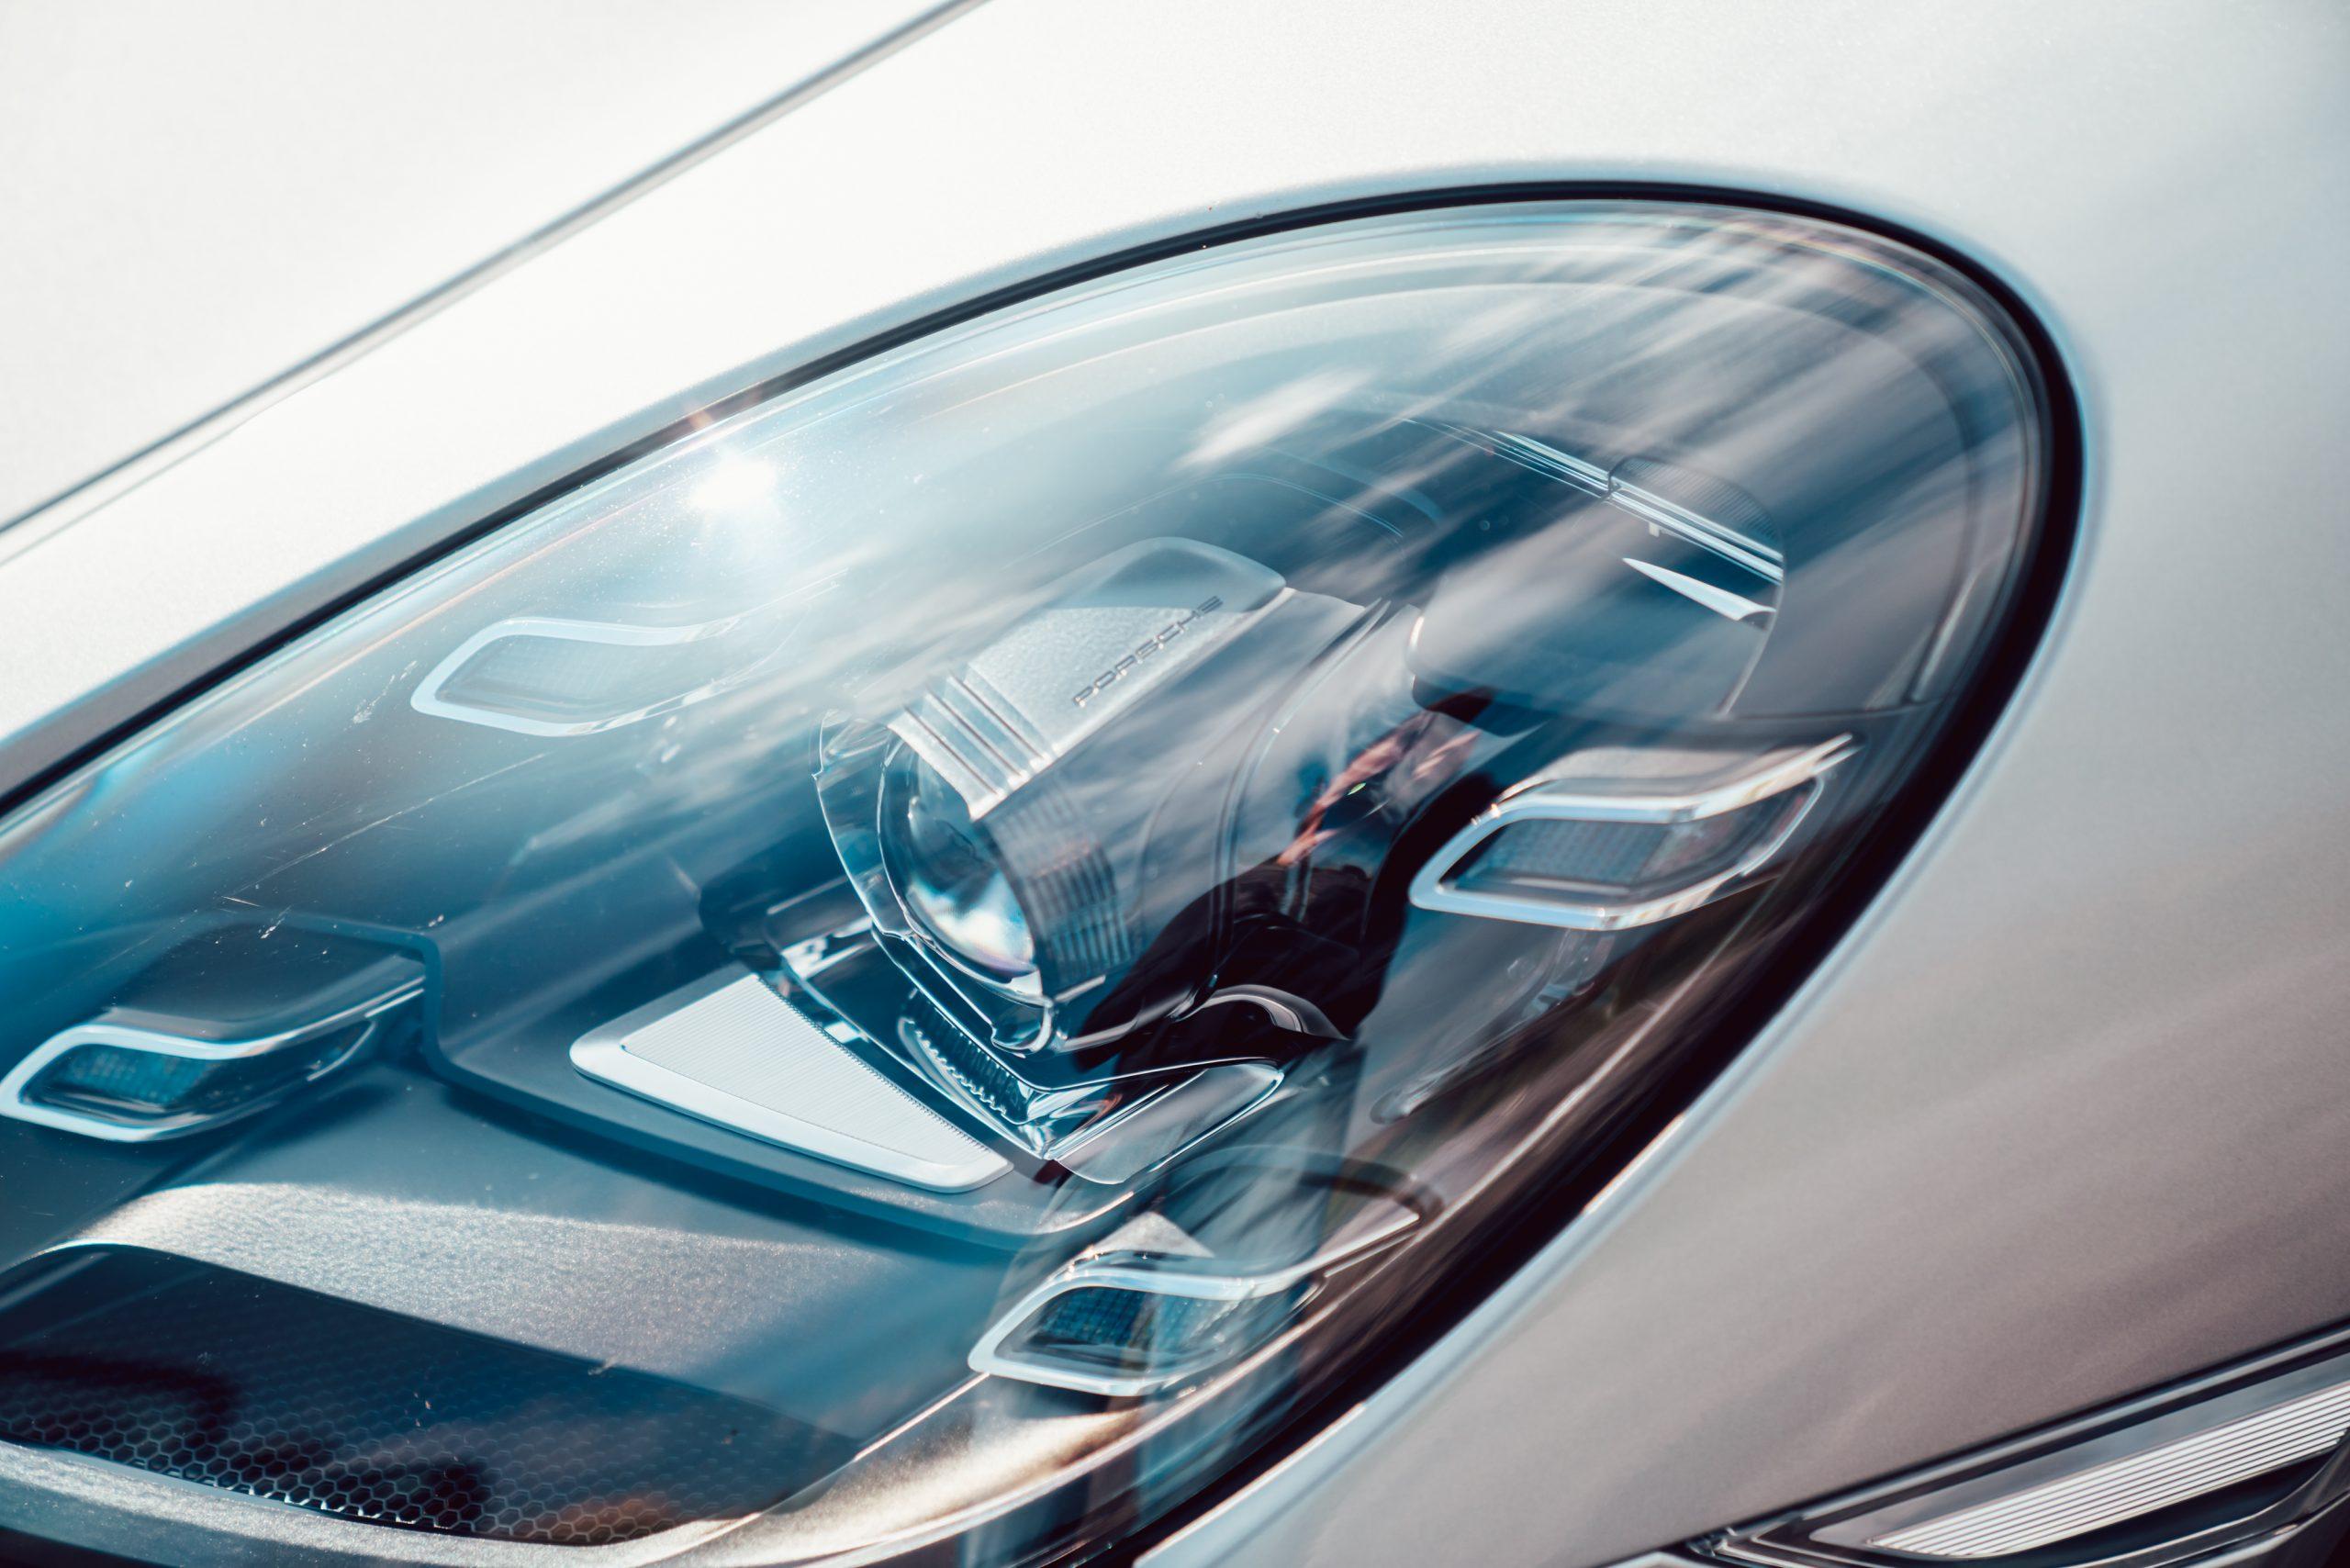 2021 Porsche Boxster 25 Years headlight closeup